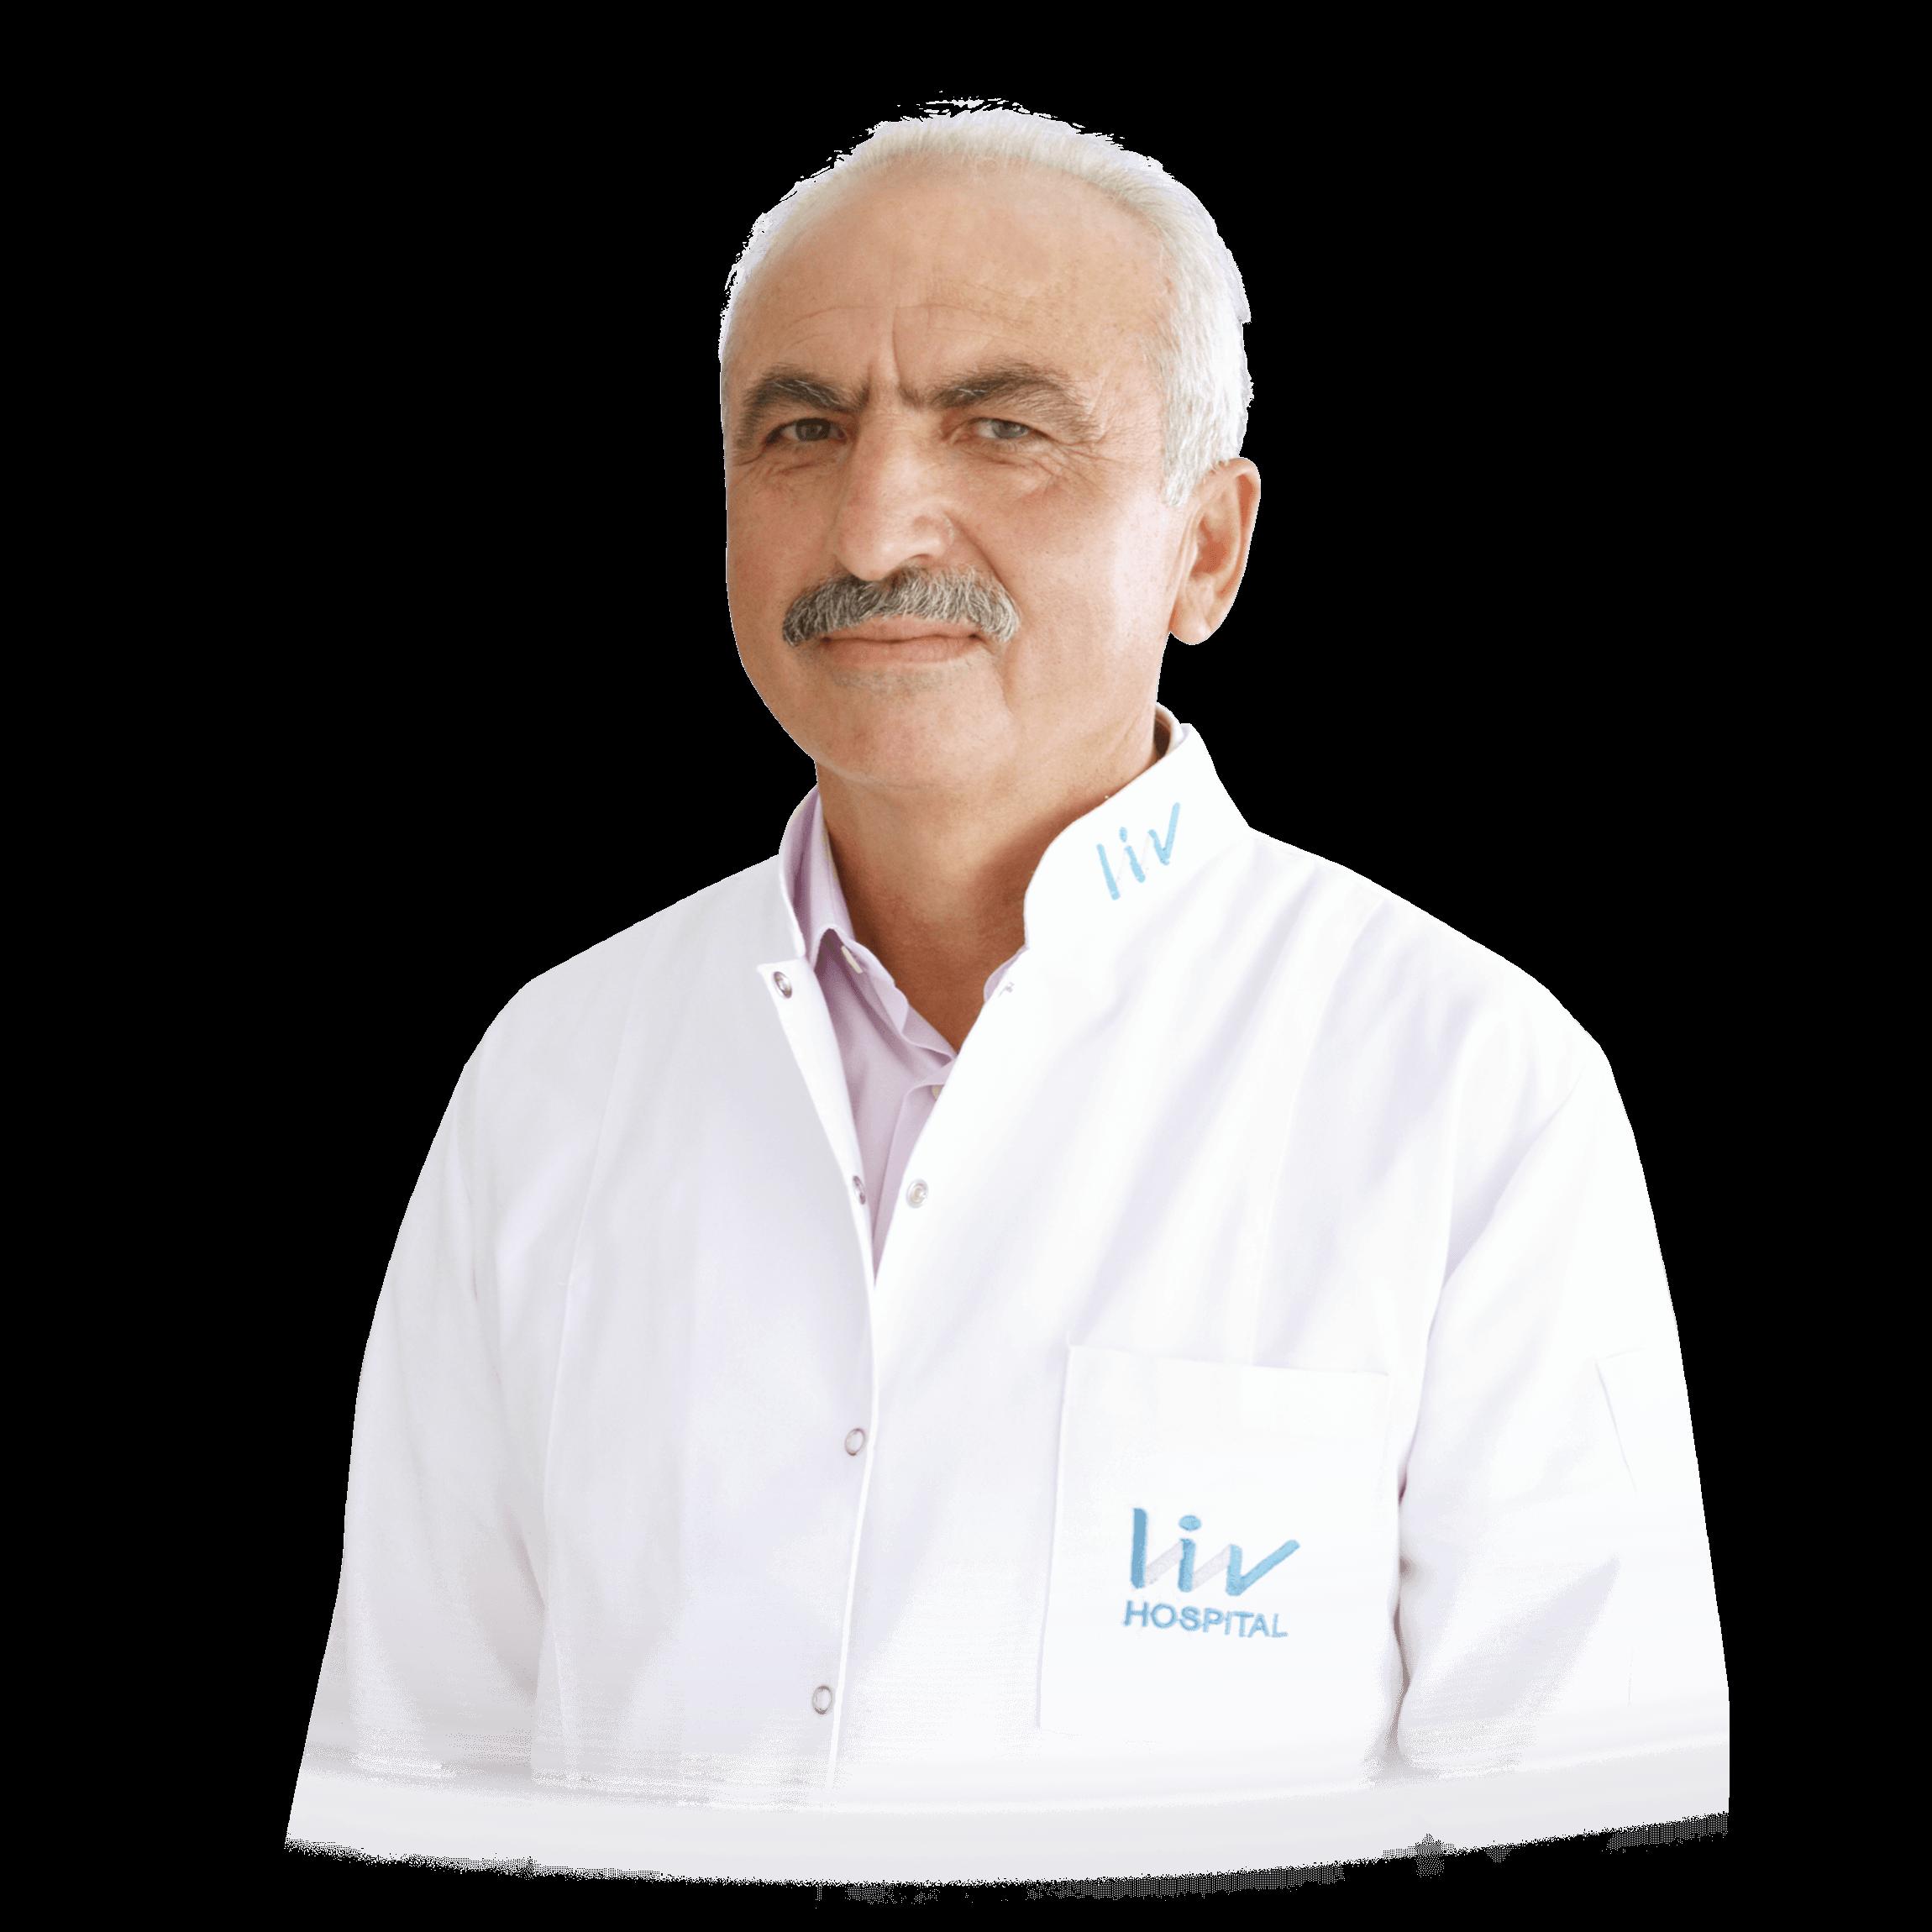 Prof. Dr. Mustafa Sünbül